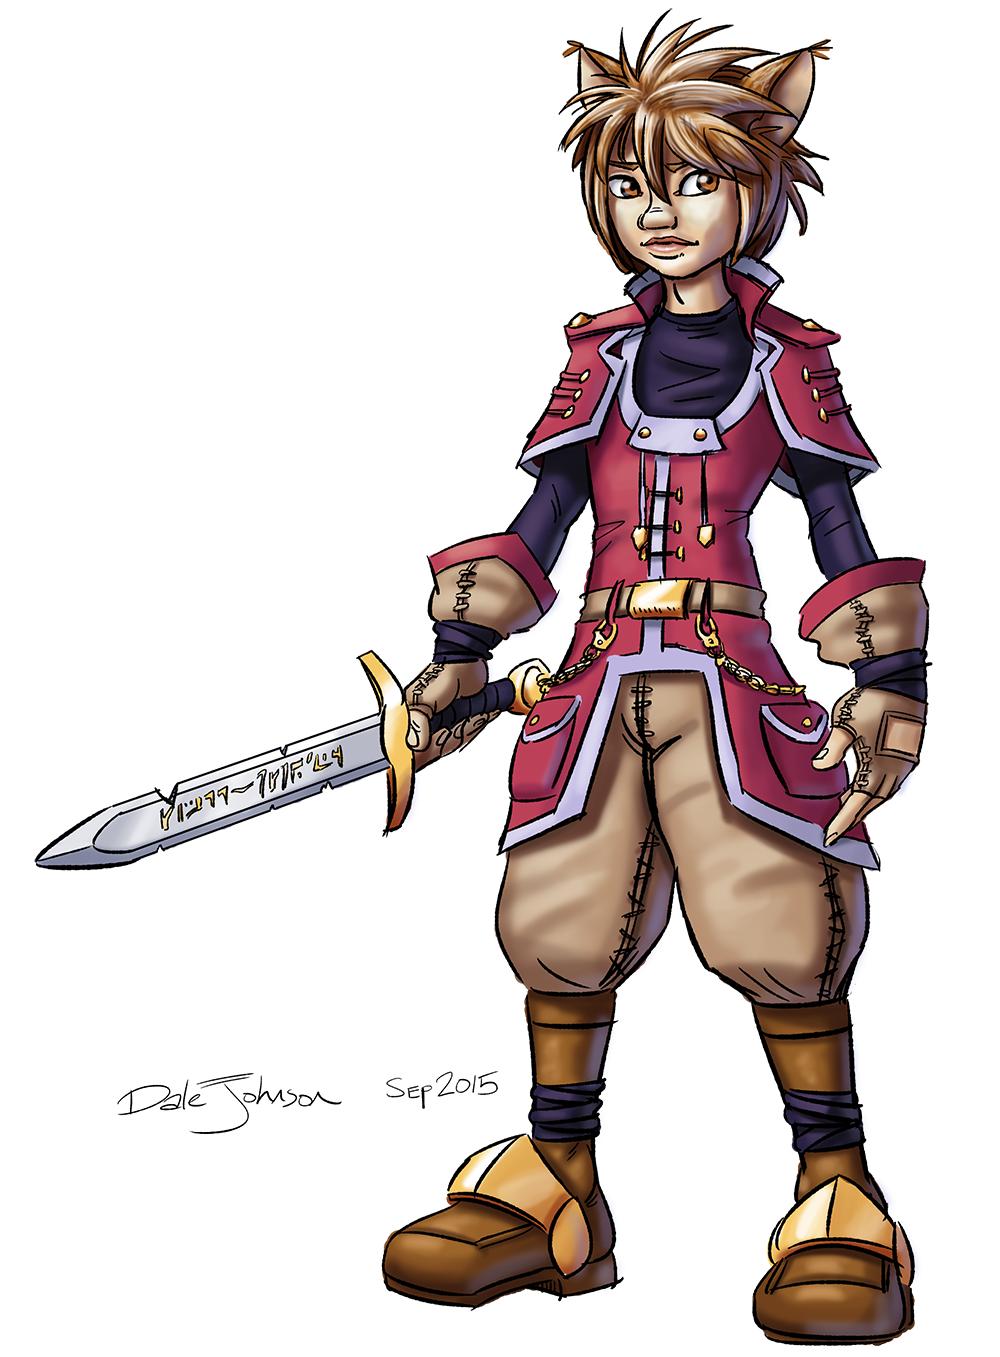 Feral Warrior by TheGrandHero